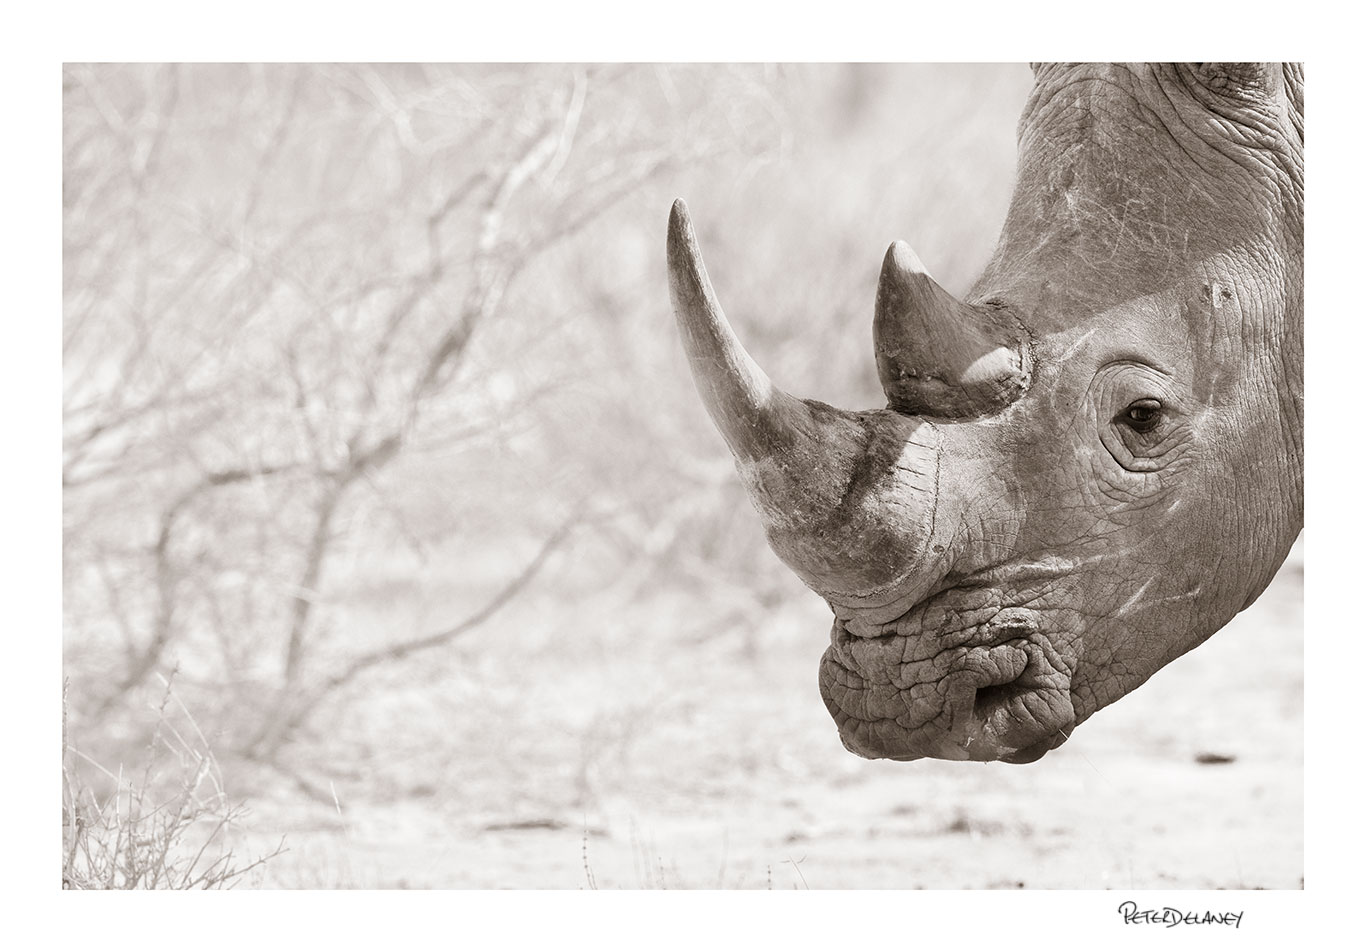 Marathaba+White+Rhino.jpg